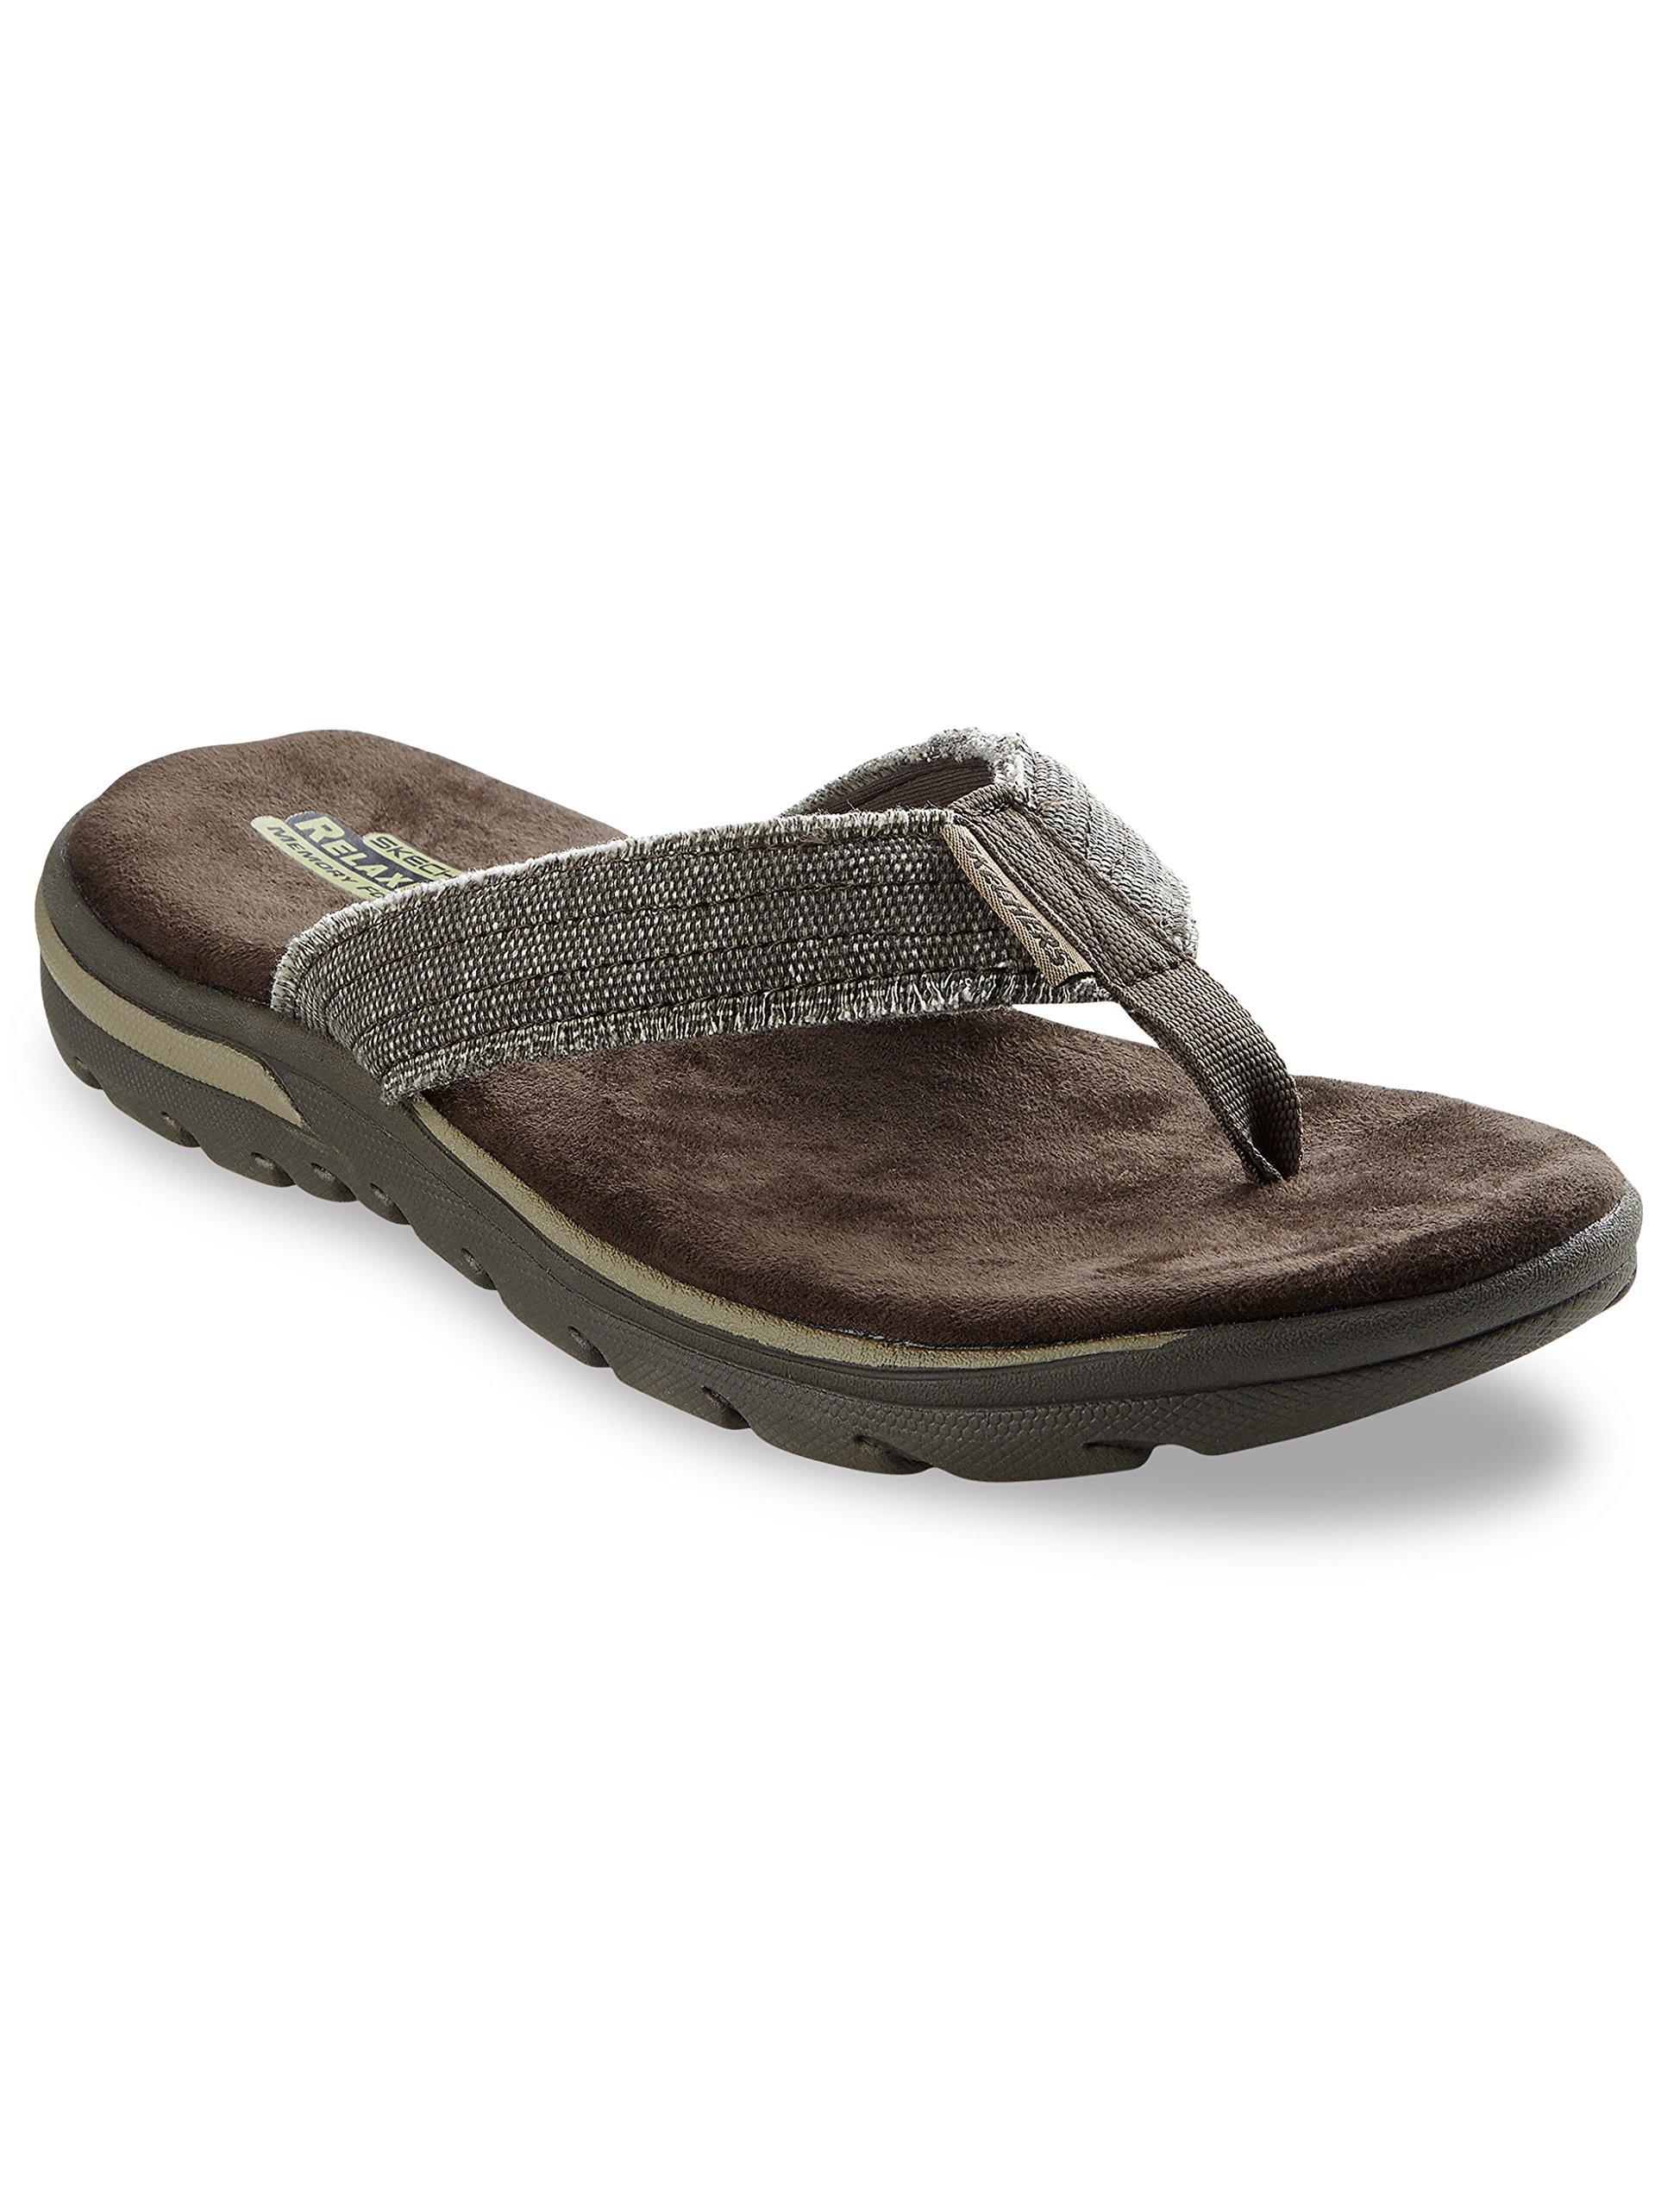 Skechers Men's, Supreme Bosnia Thong Sandals Chocolate 16 M